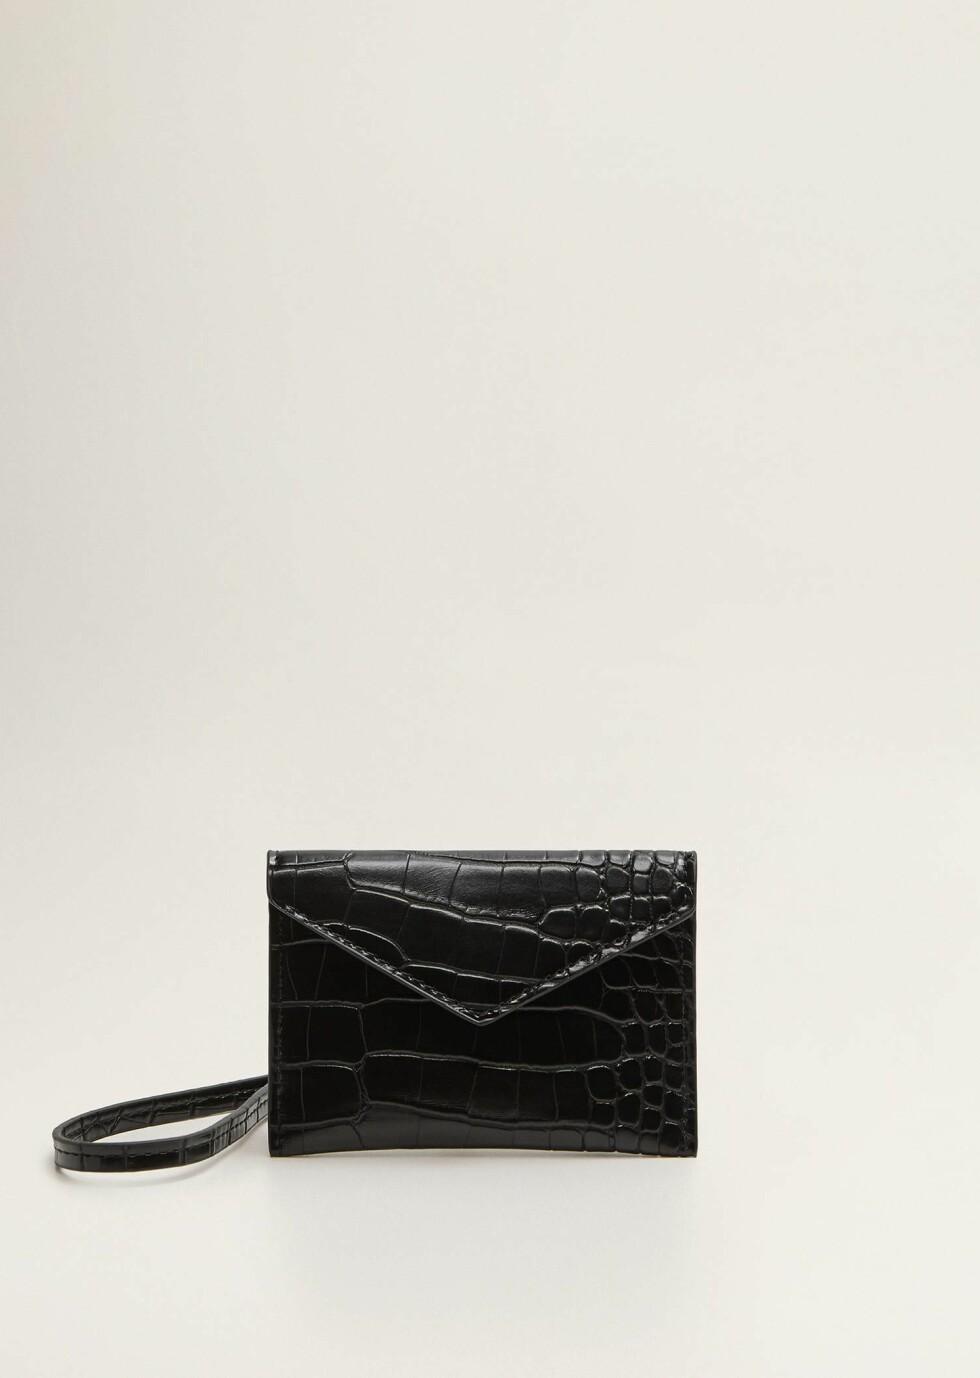 Veske fra Mango  99,-  https://shop.mango.com/no-en/women/bags-mini/purse-mini-bag_33087676.html?c=99&n=1&s=accesorios_she.accesorio;40,340,440